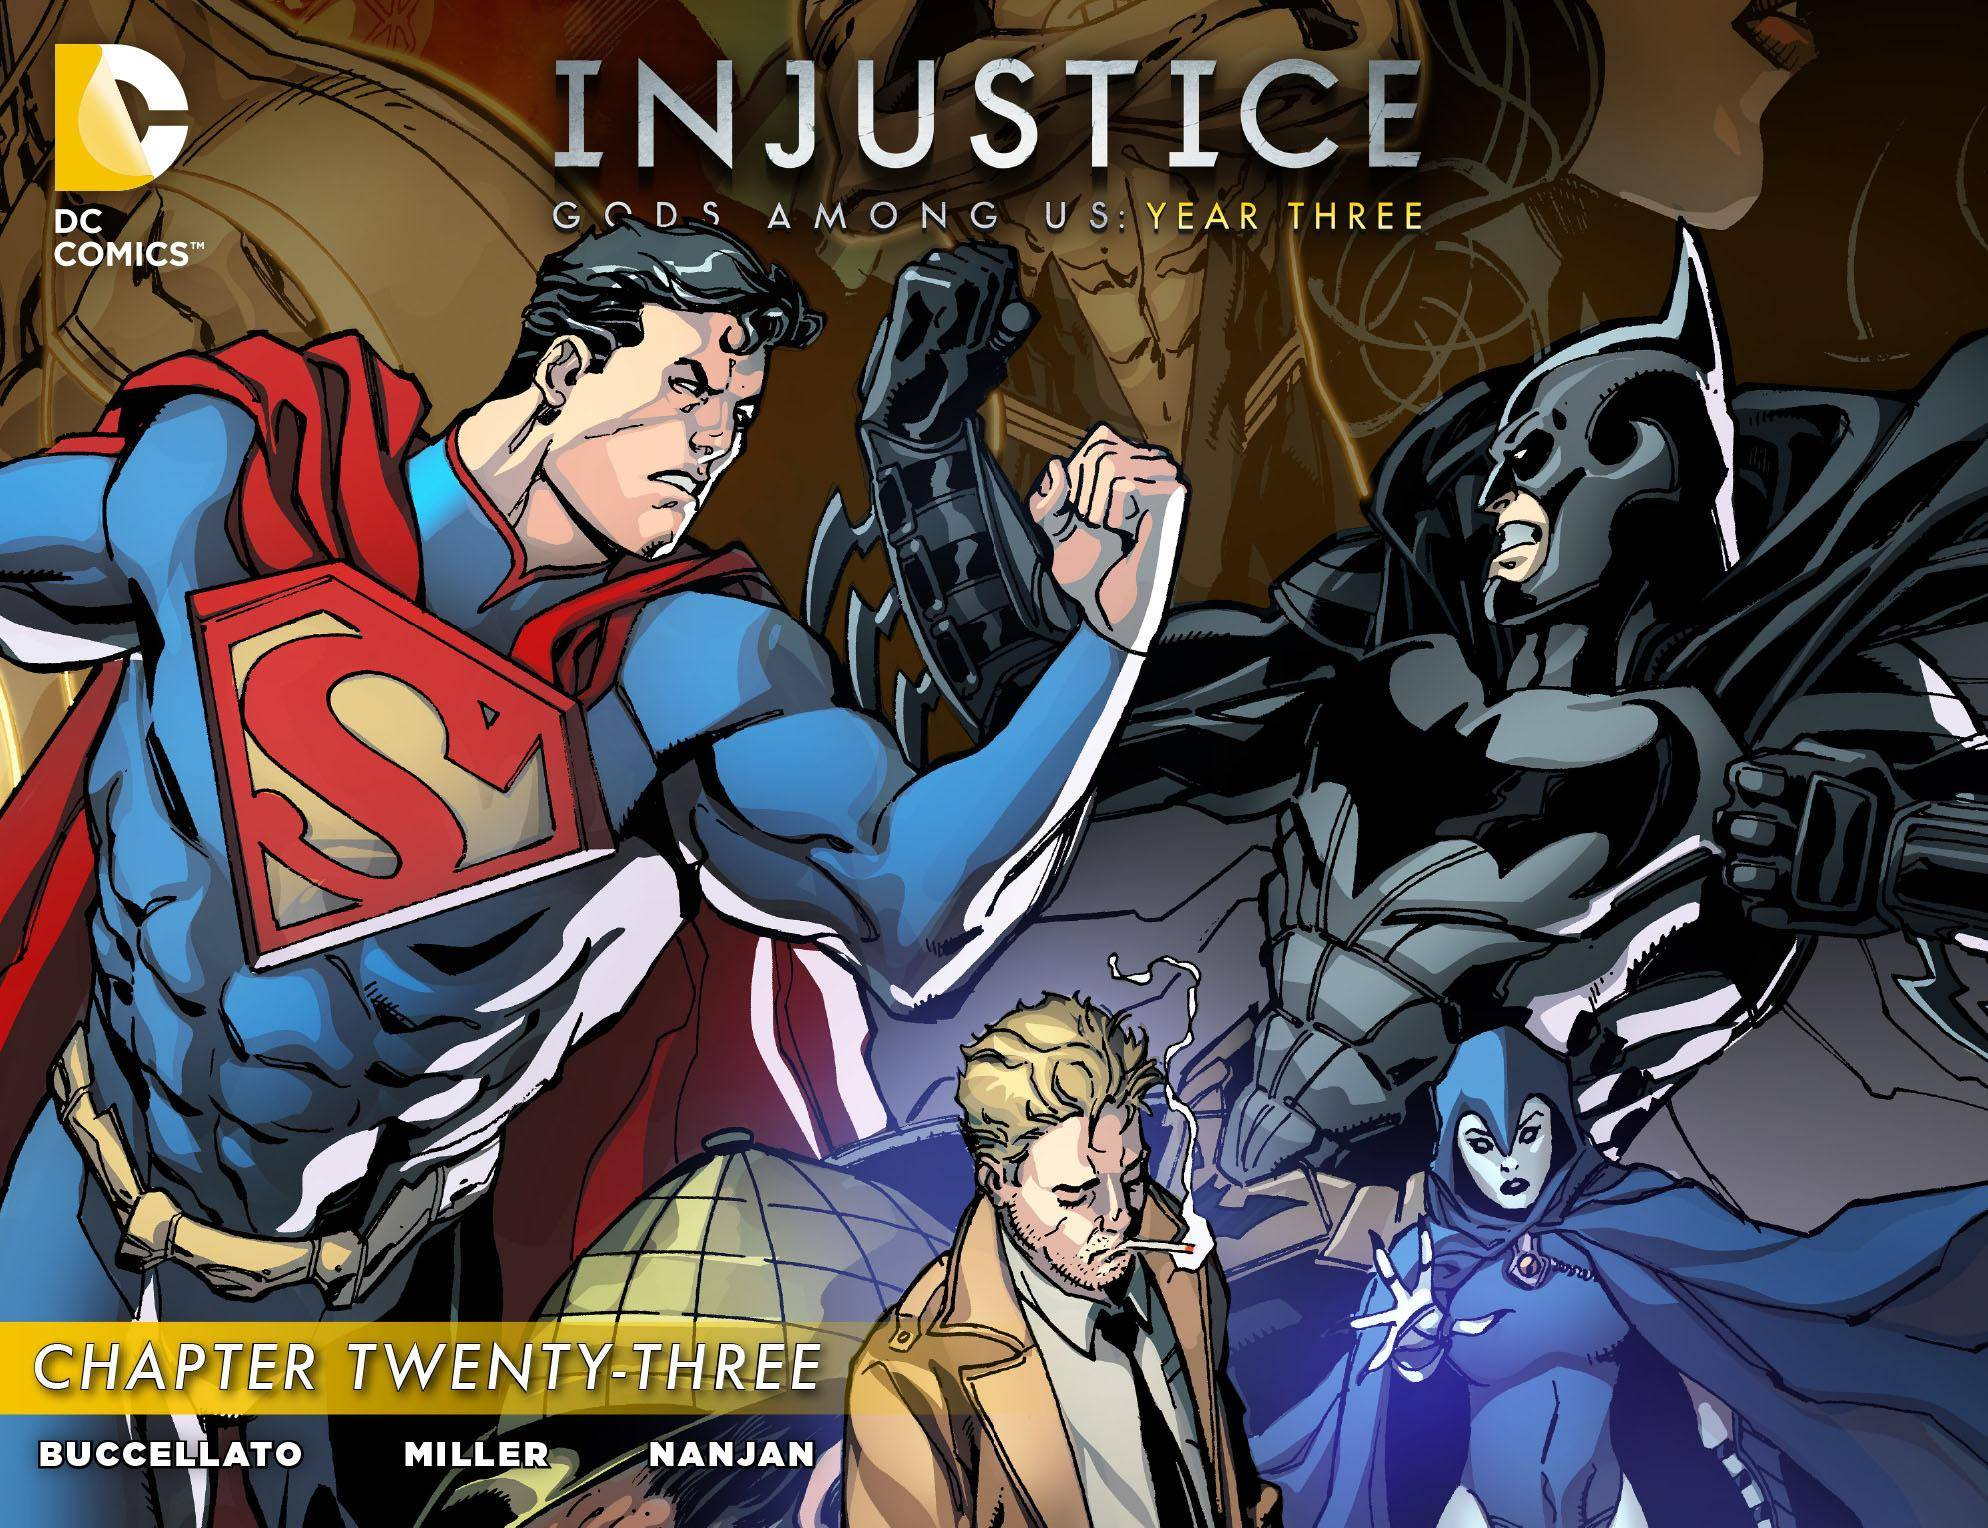 Injustice - Gods Among Us - Year Three 023 2015 digital